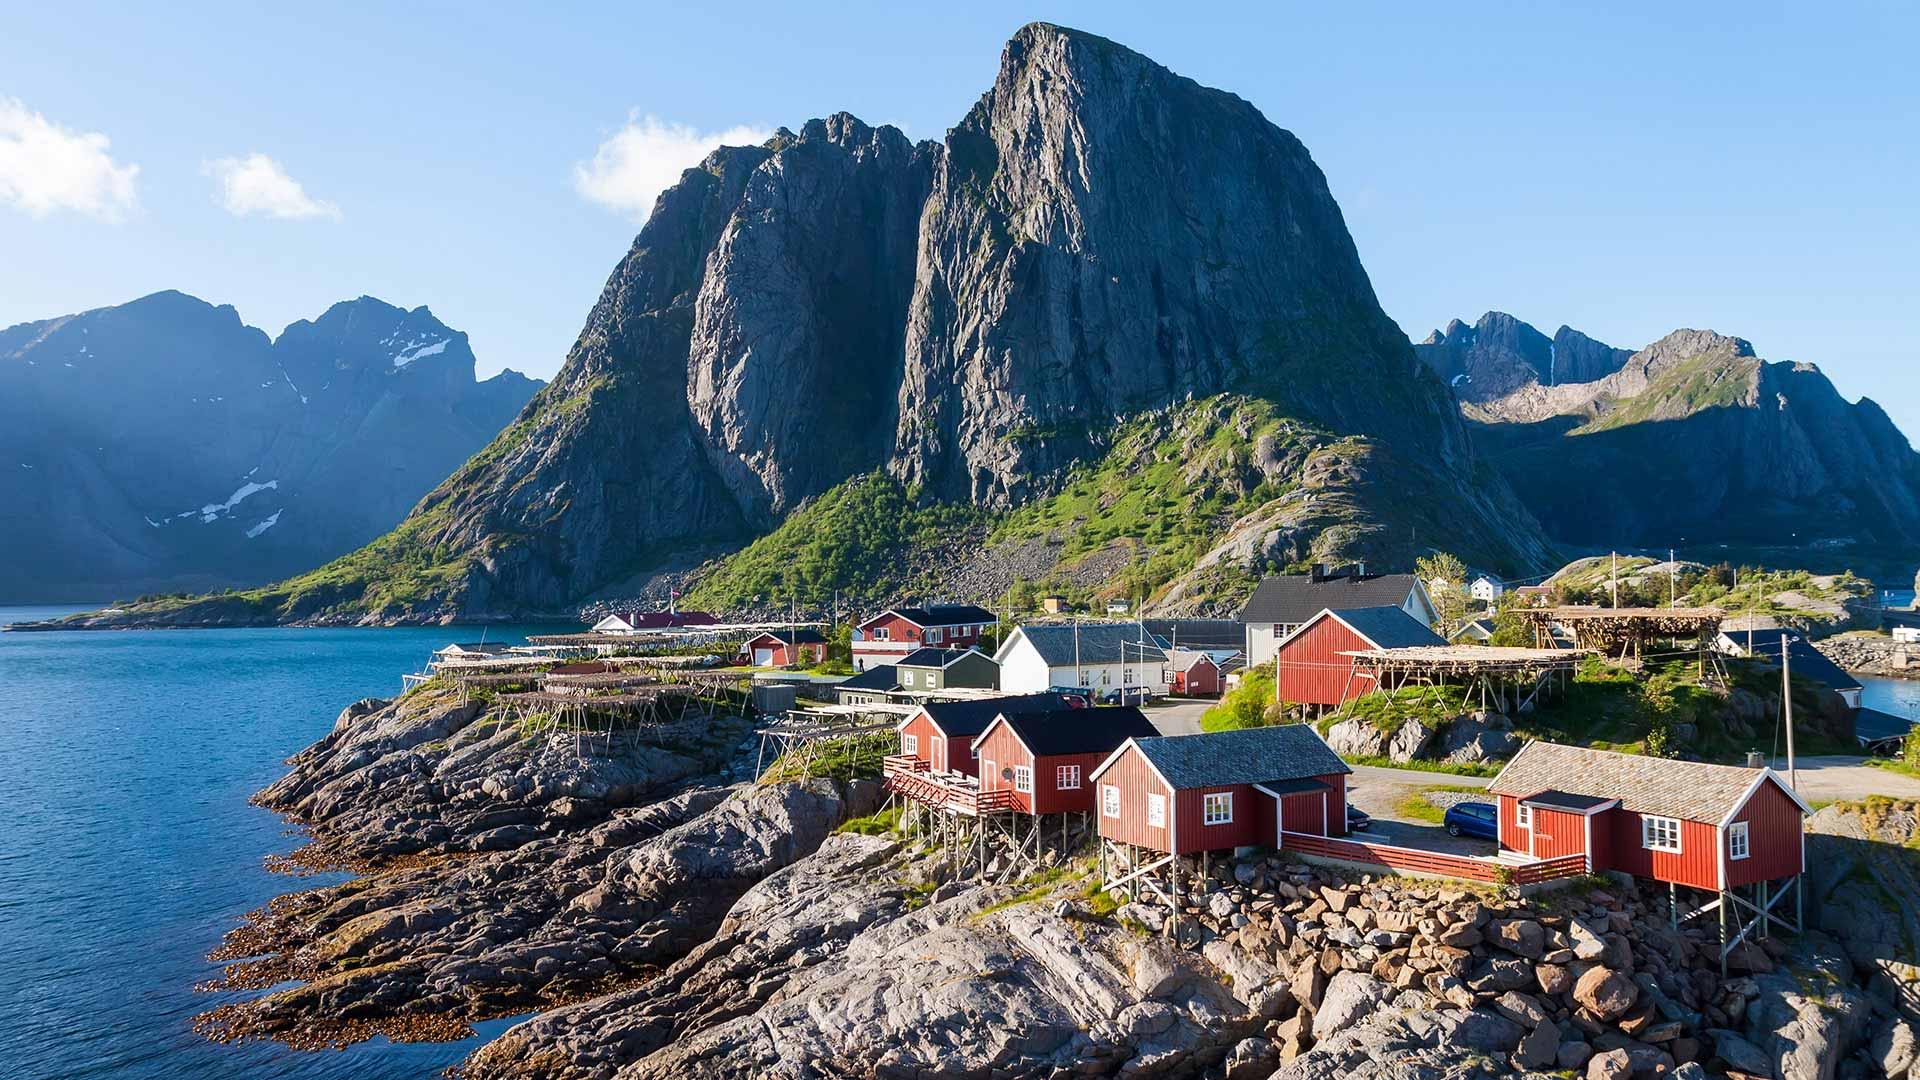 lofoten islands : tours & travel packages to lofoten islands in